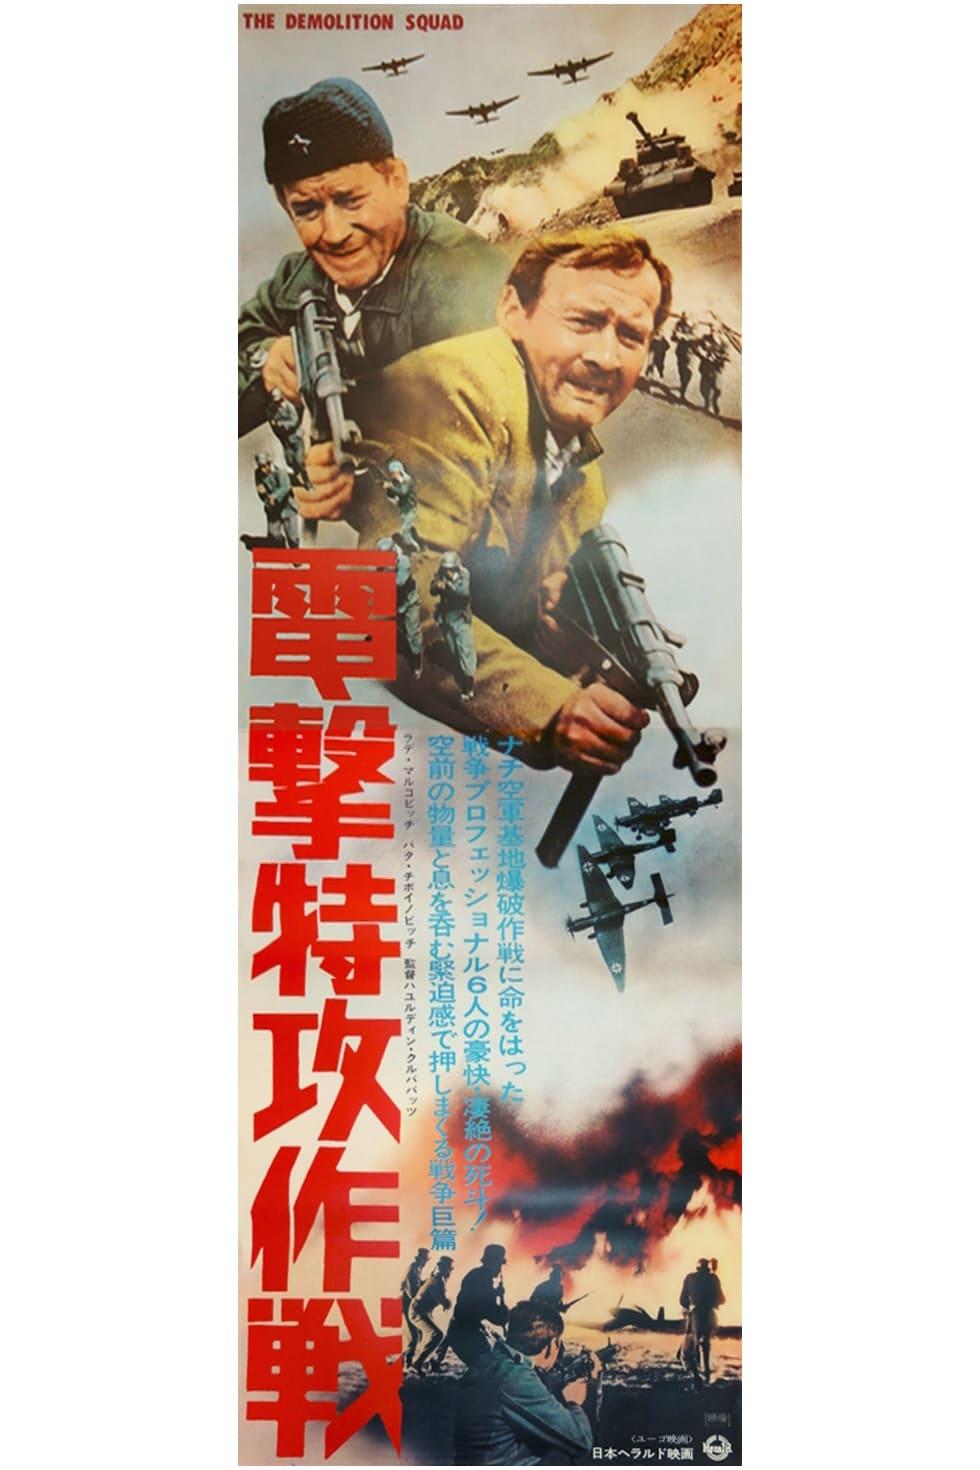 The Demolition Squad (1967)